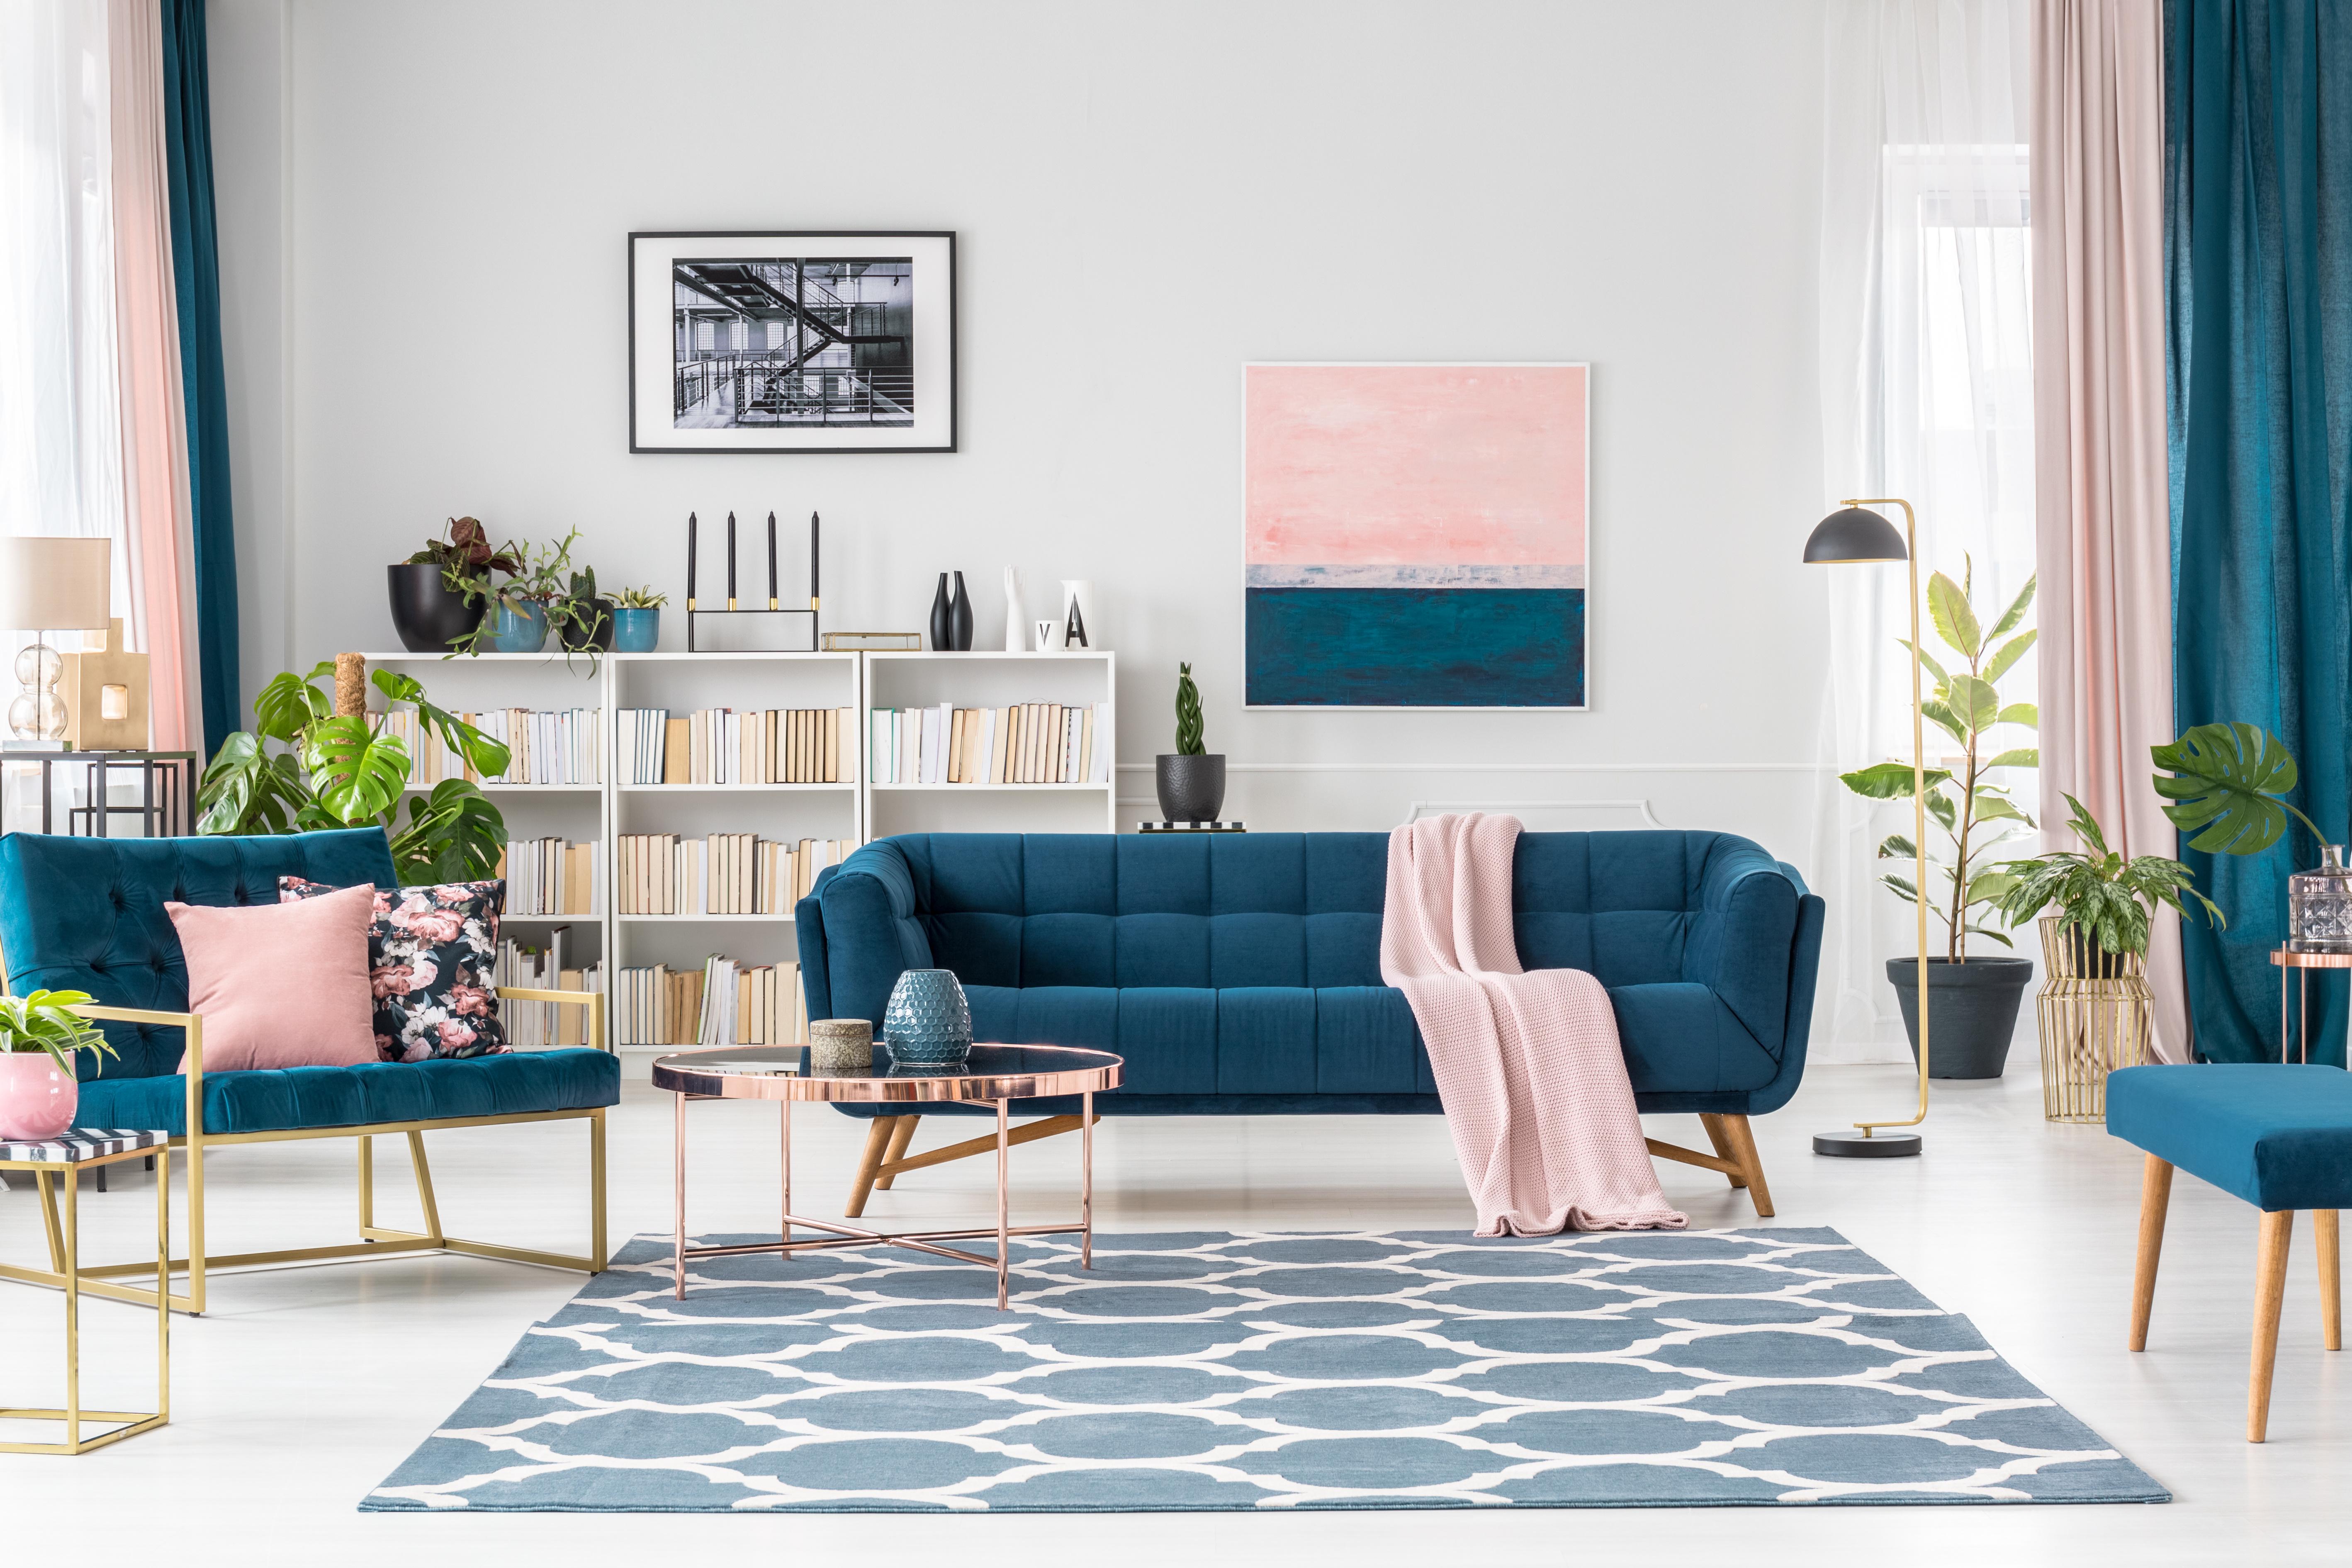 tapis bleu couleur froide